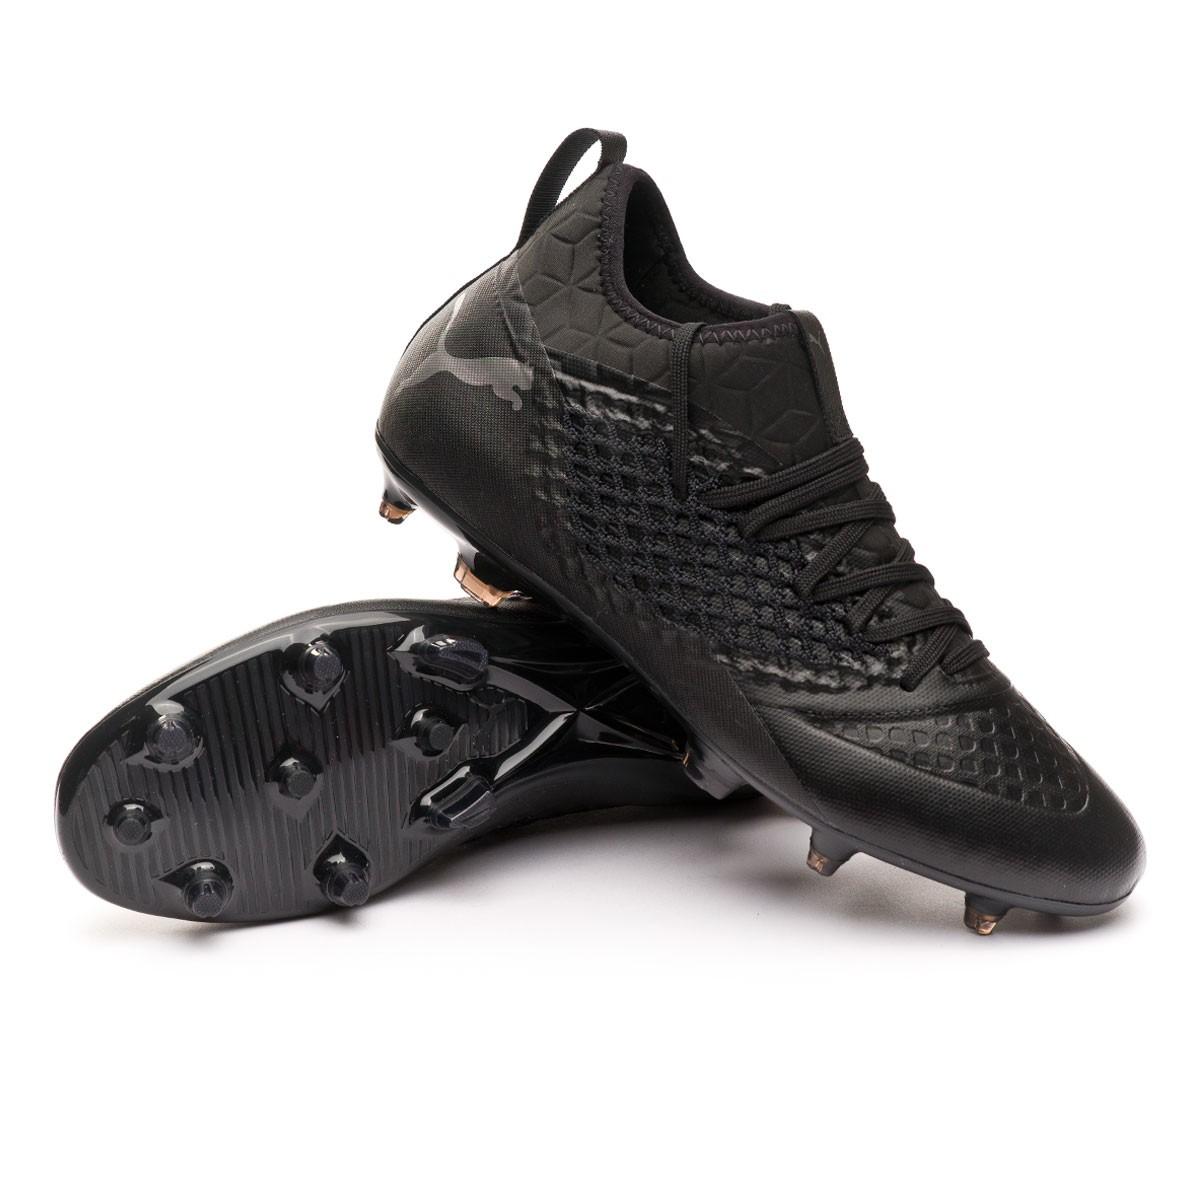 c9806ada6d9d4 Zapatos de fútbol Puma Future 2.3 Netfit FG AG Puma black - Tienda de  fútbol Fútbol Emotion